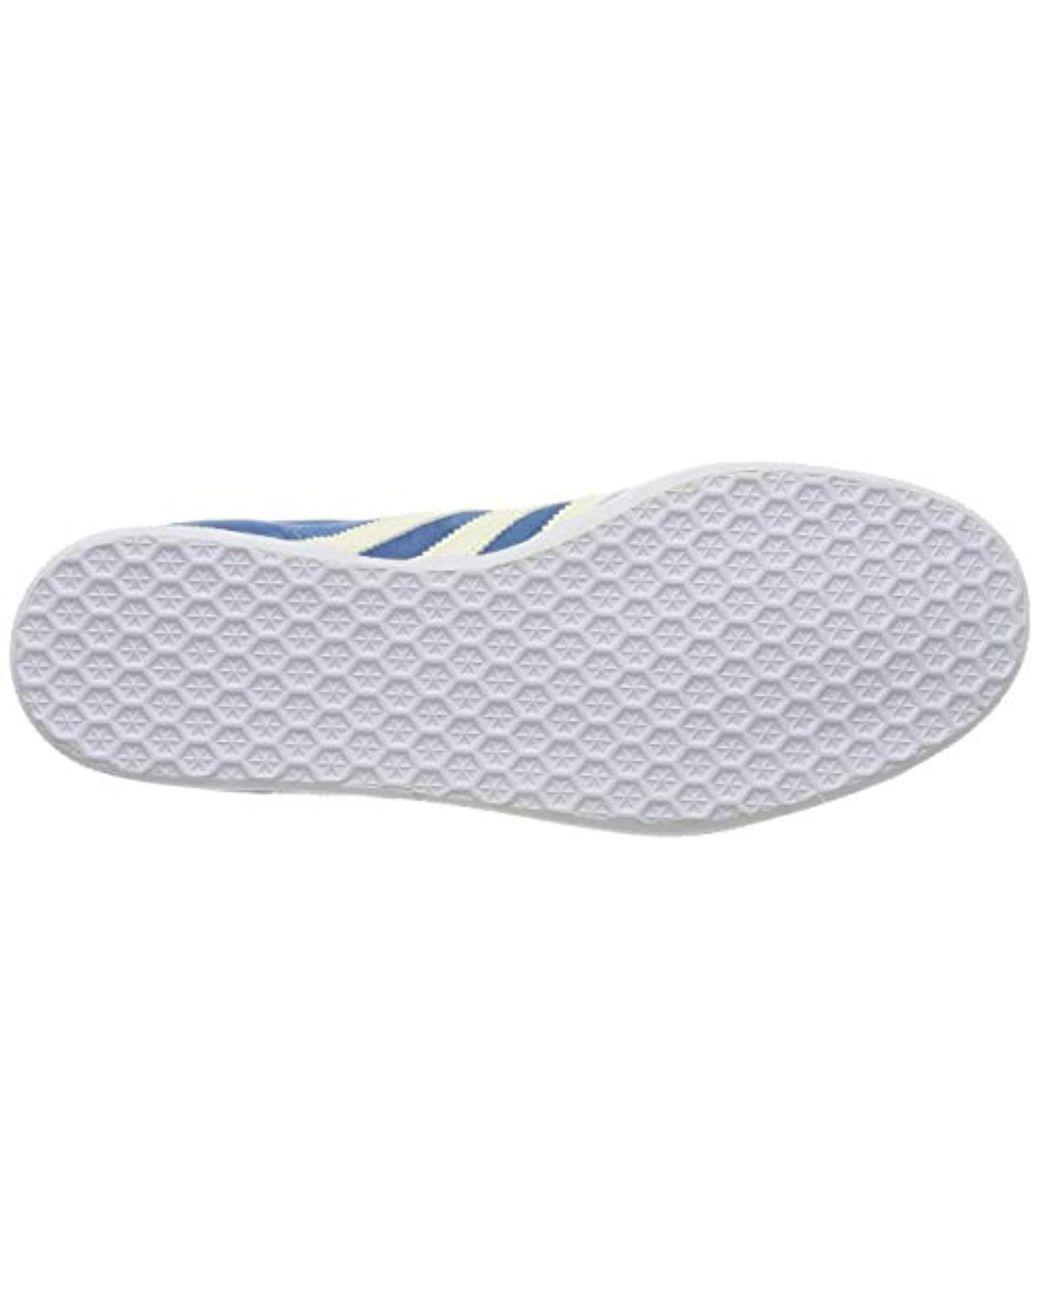 adidas Originals GAZELLE Marine Gratis levering | Spartoo